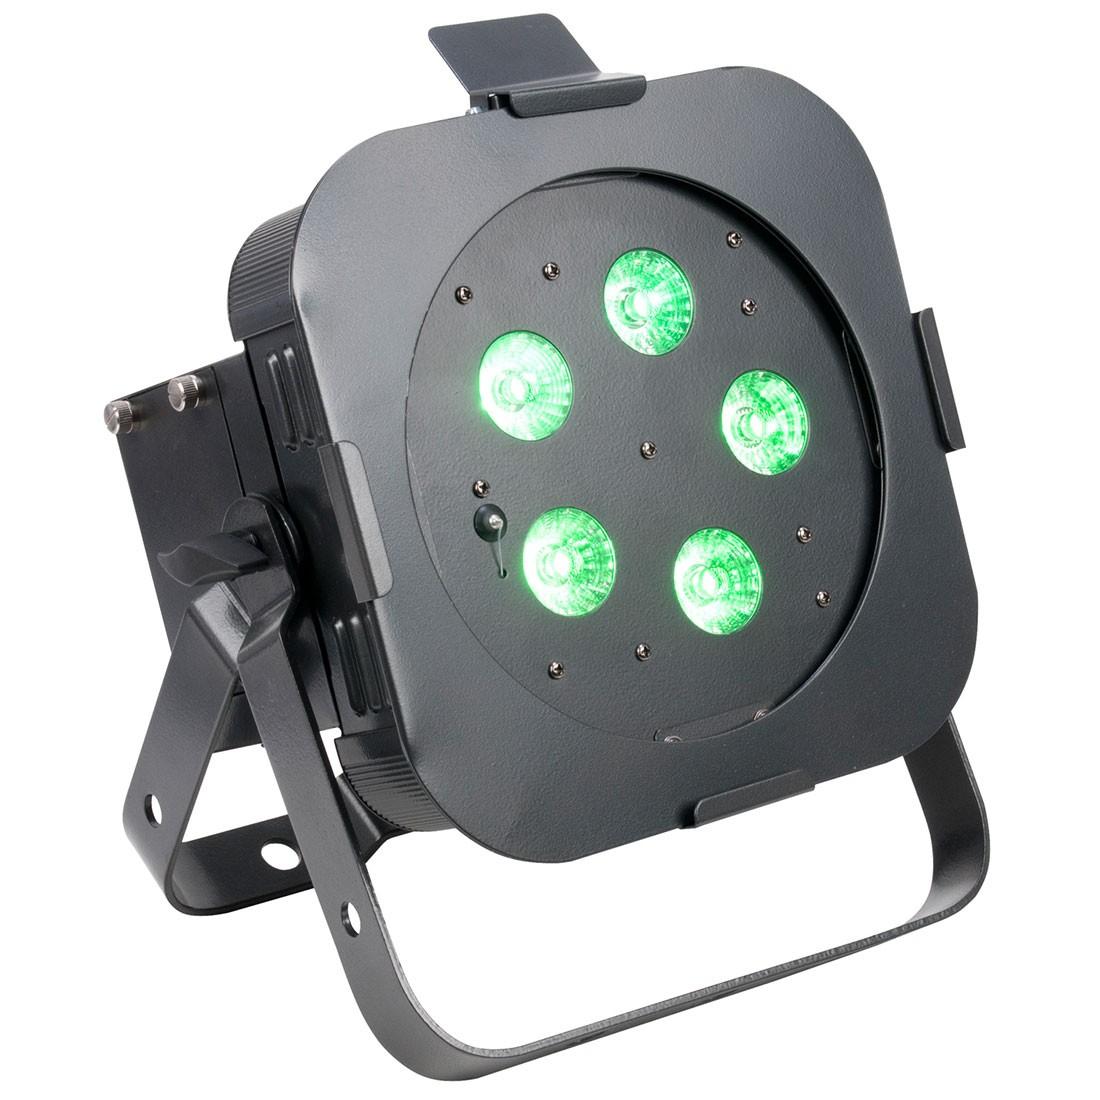 5x10W RGBWA+UV Compact Par Wash with Built-In WiFly EXR